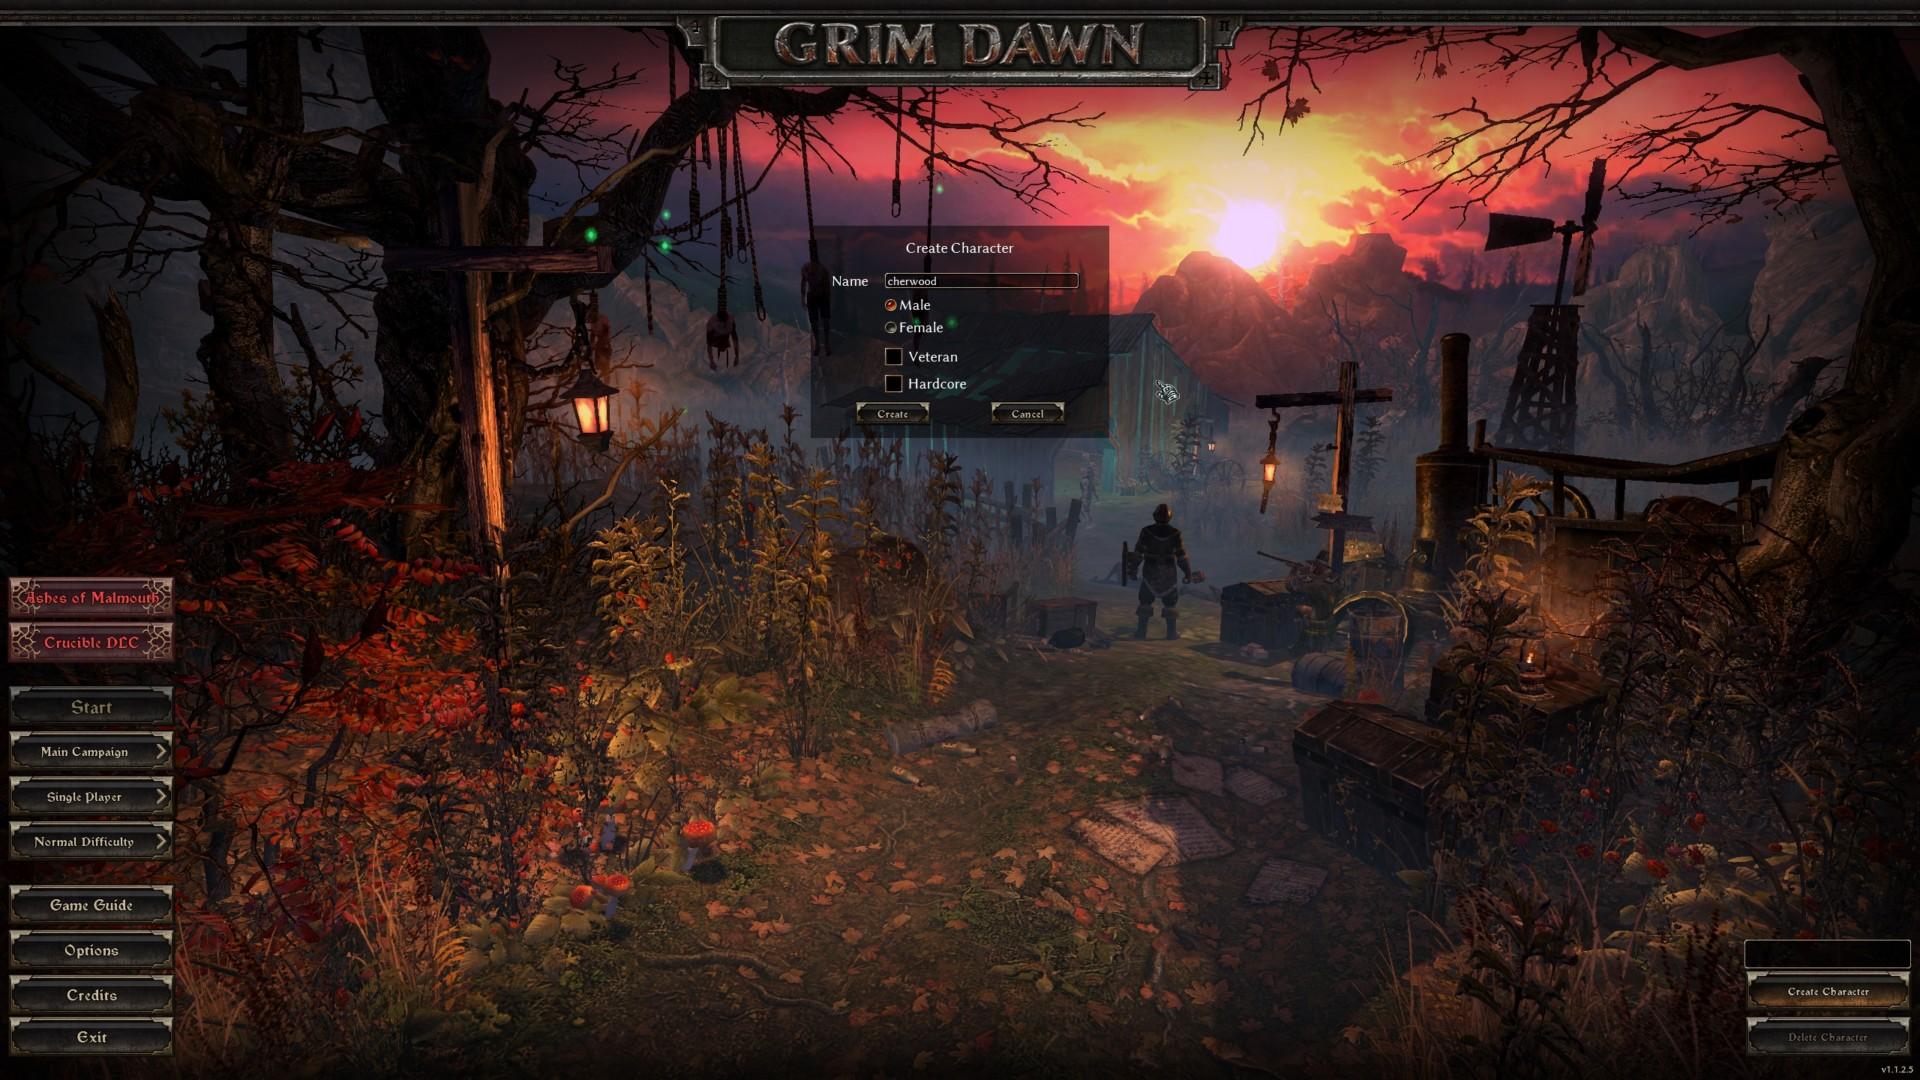 grim-dawn-create-character